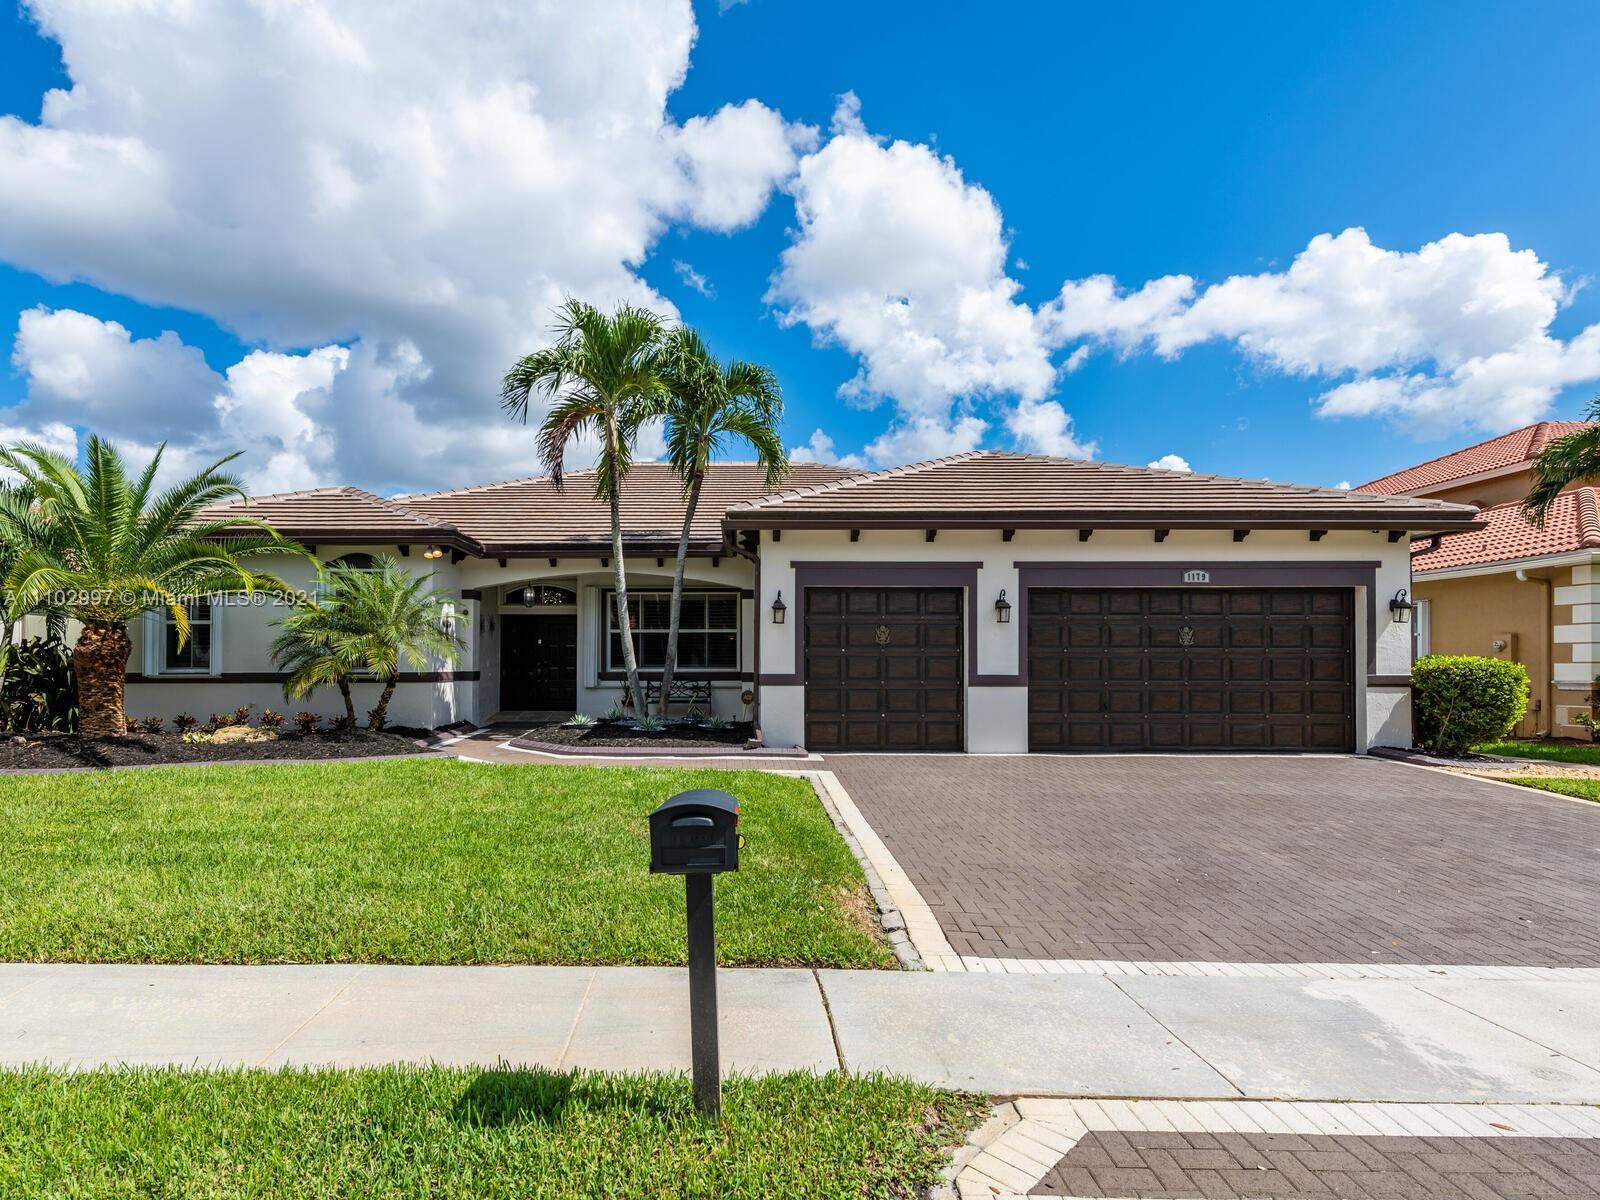 The Estates of Pembroke Shores - 1179 SW 159th Ter, Pembroke Pines, FL 33027